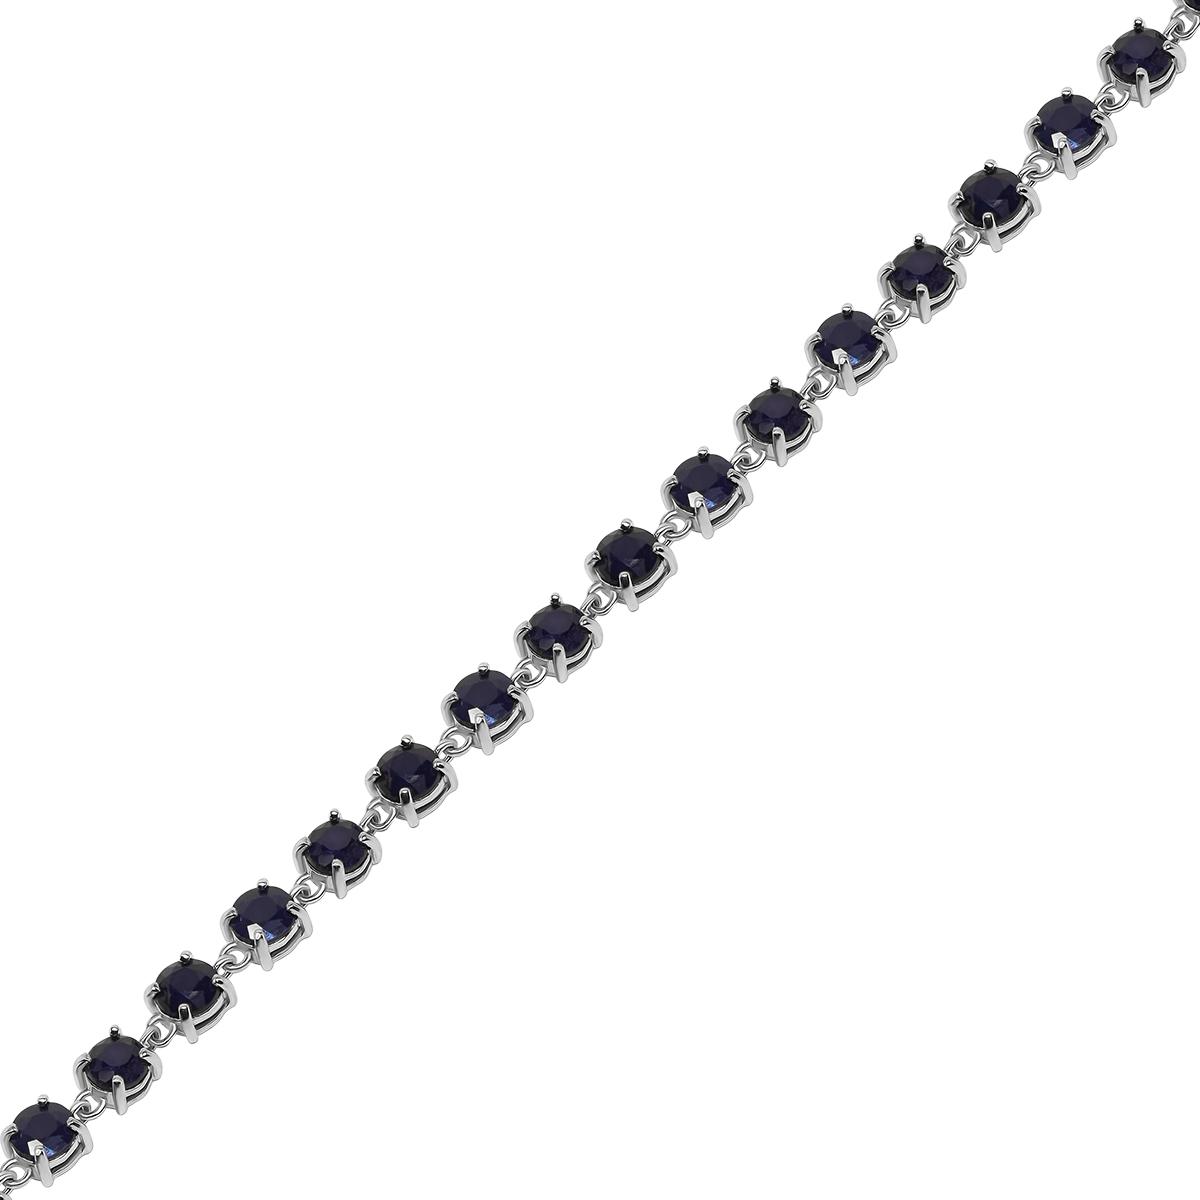 Браслет женский Balex Jewellery 7405937841 из серебра, сапфир, р. 21